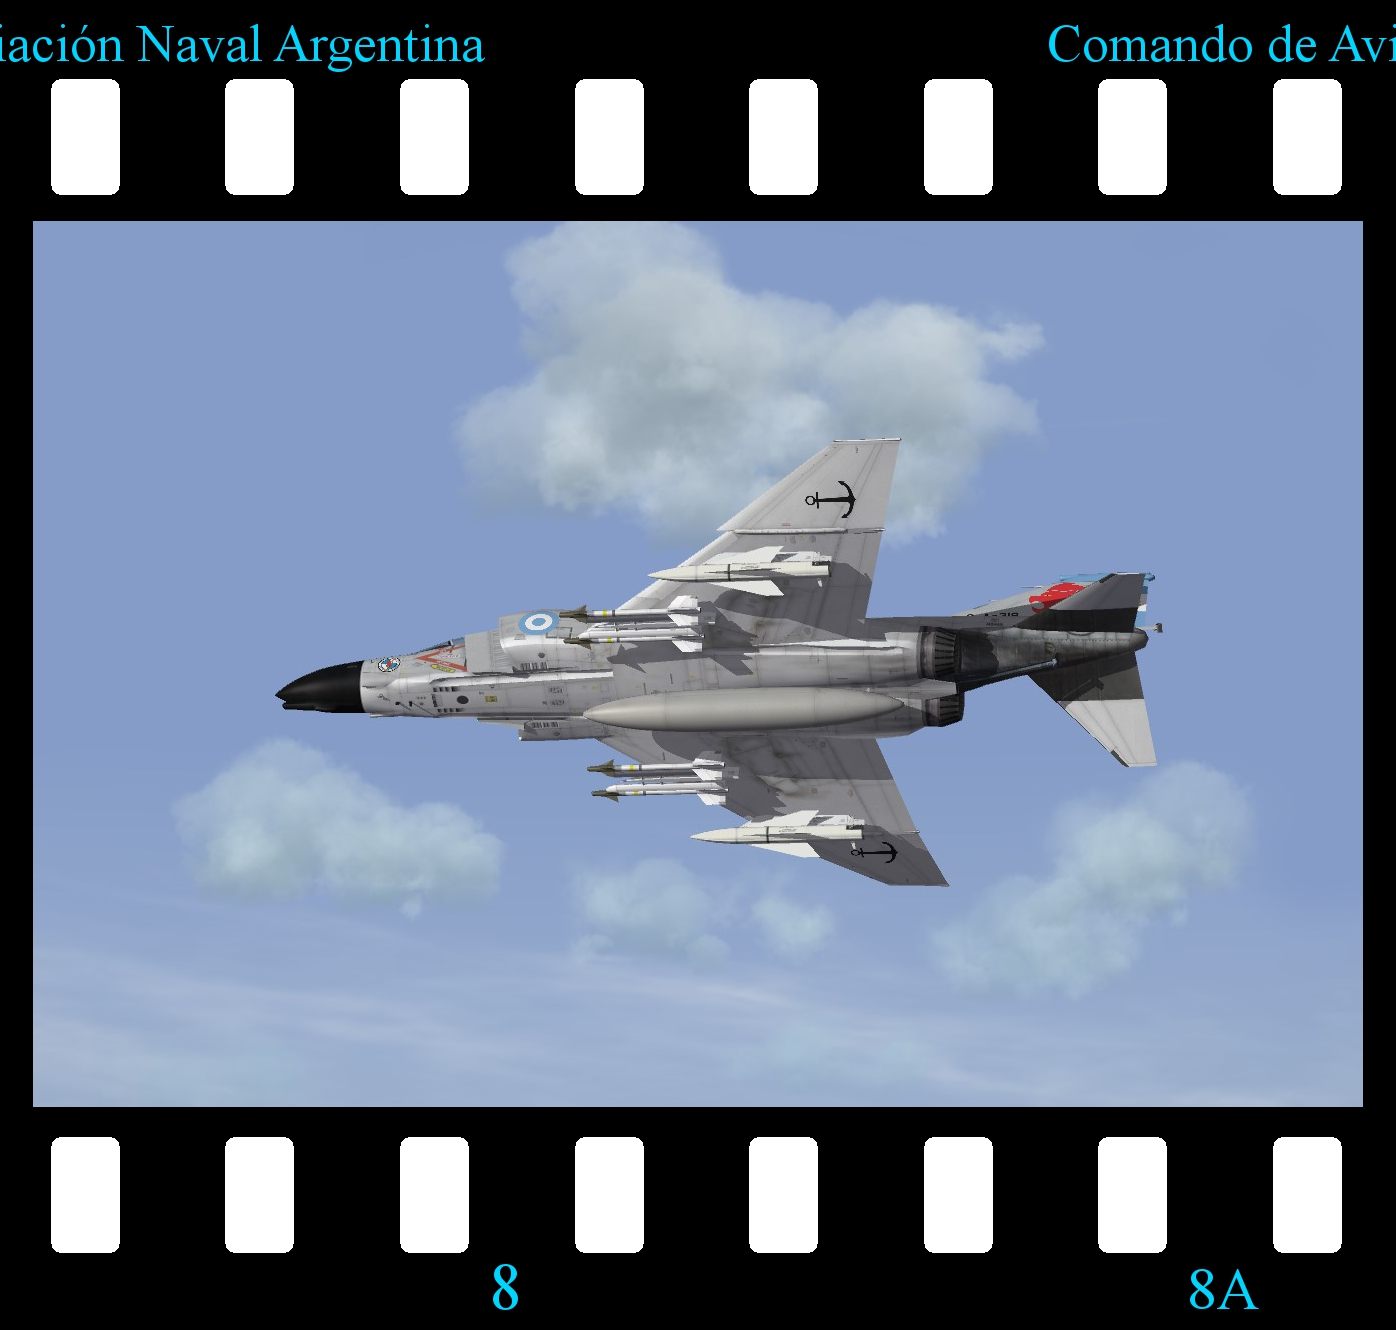 [Fictional] McDonnell Douglas F-4B Phantom 'COAN'